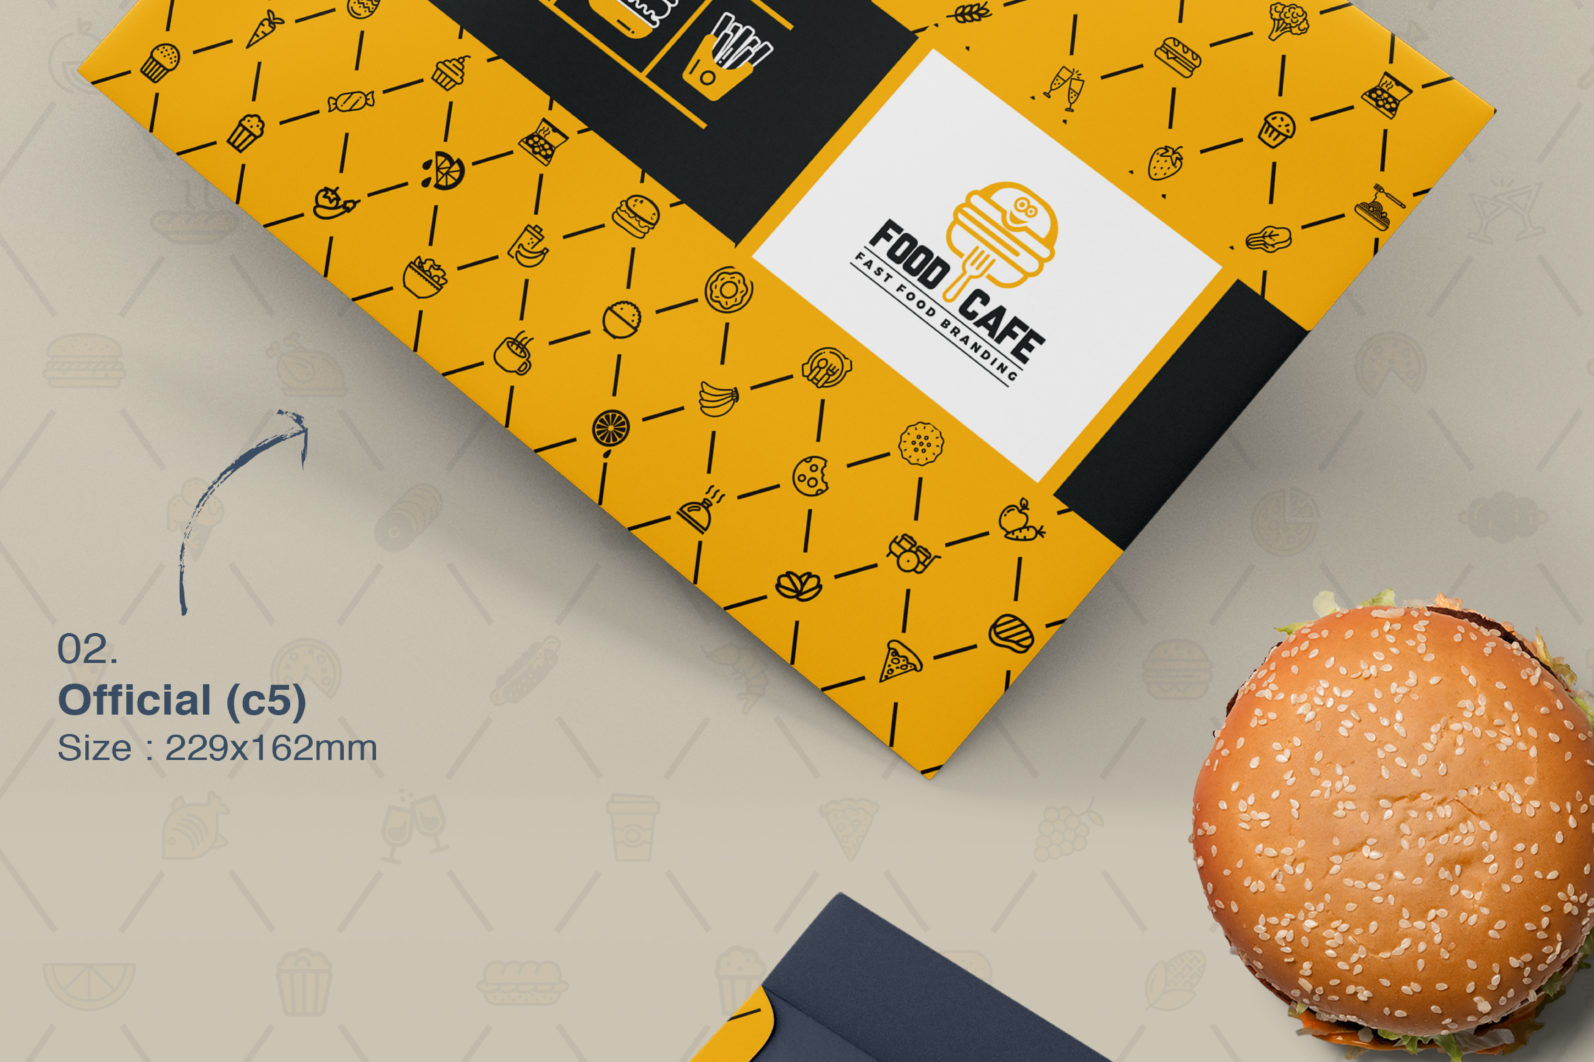 Mega Stationery Branding Identity for Fast Food and Restaurant - 06 Envelops -